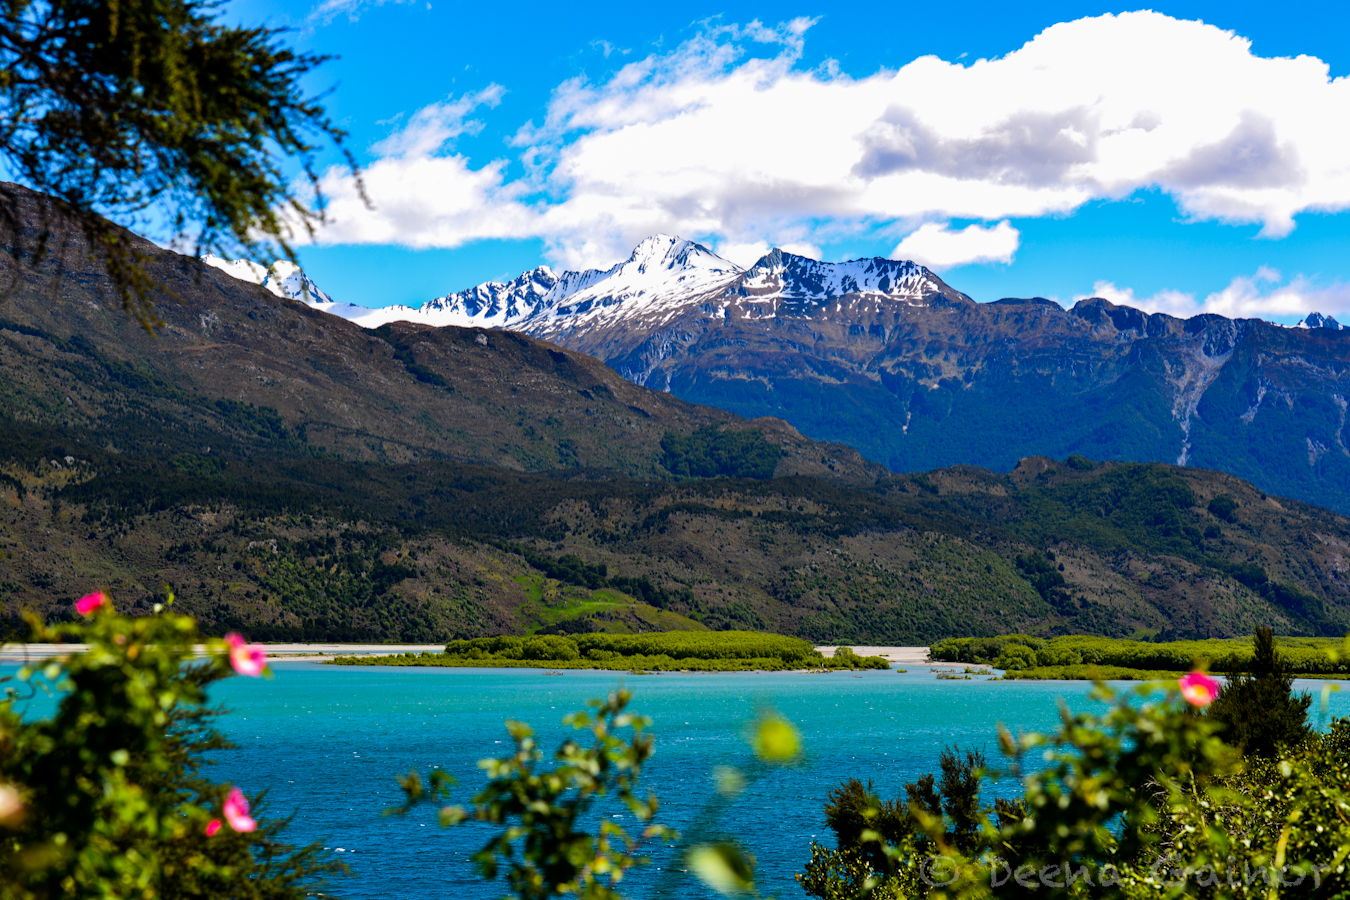 Day 197: Lake Wanaka, New Zealand | Six Hearts One Journey